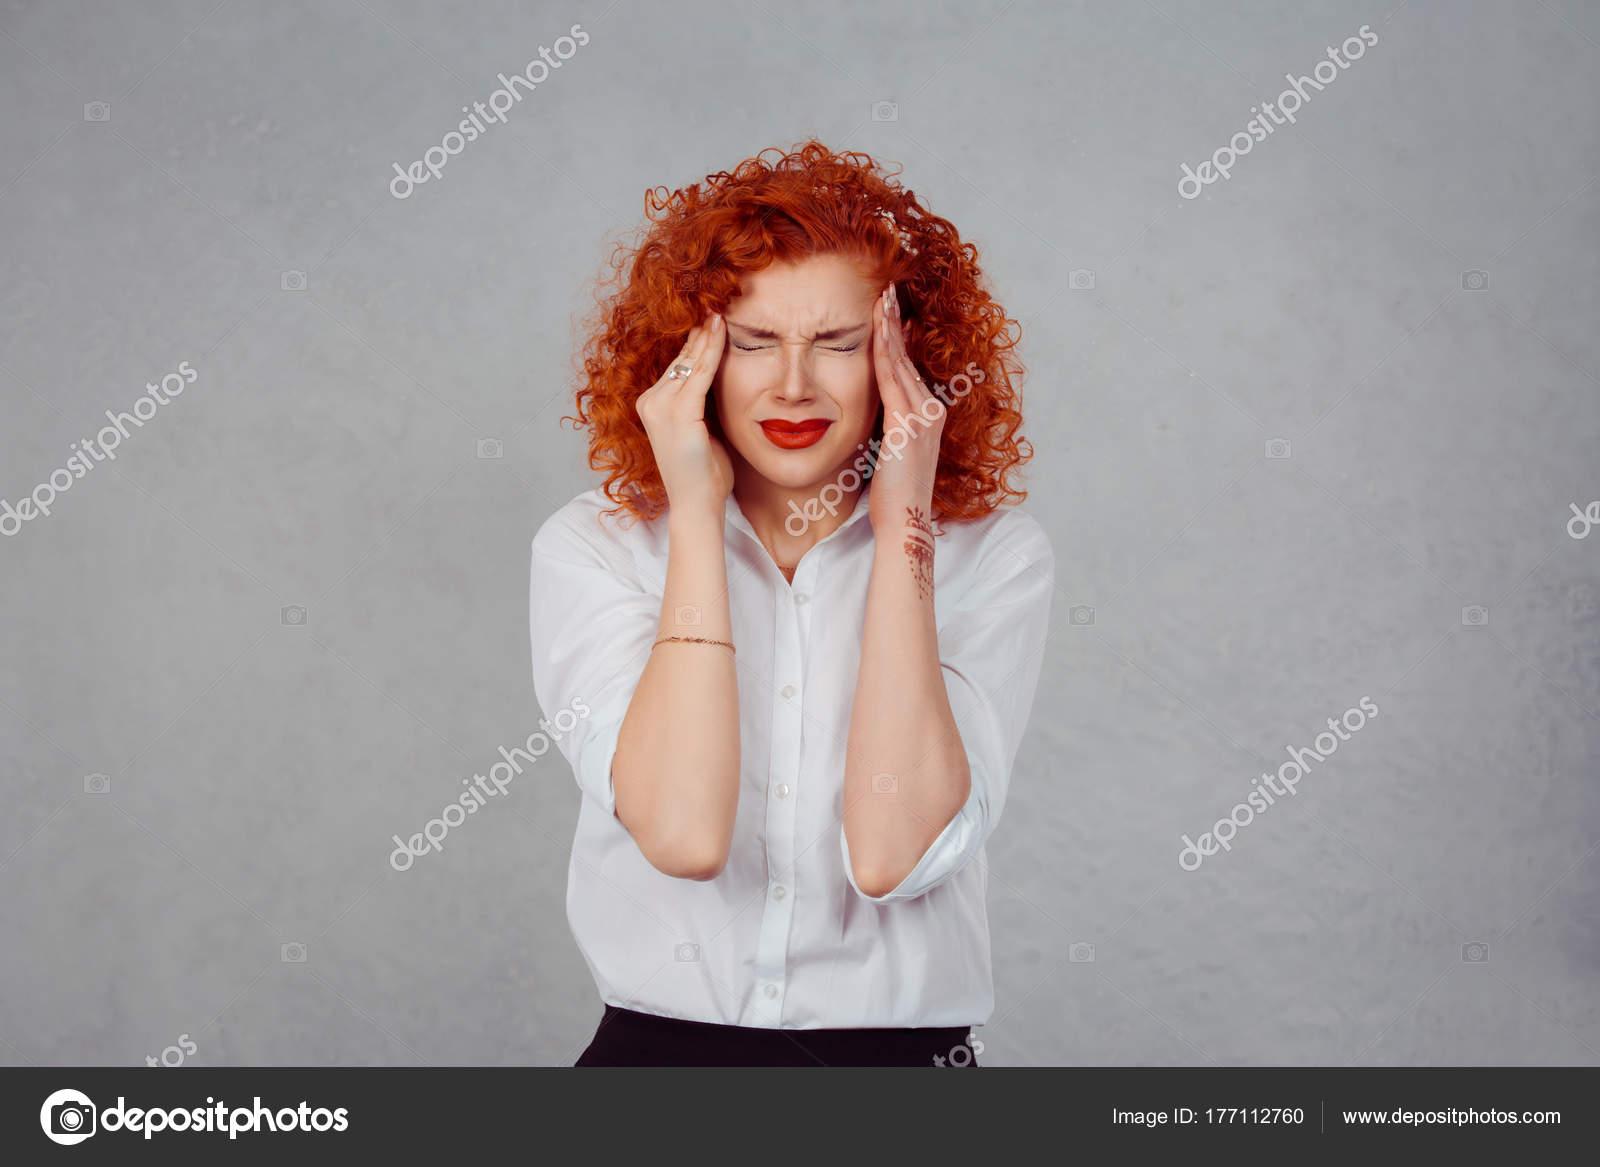 Sadness and depression  Portrait stressed sad young redhead